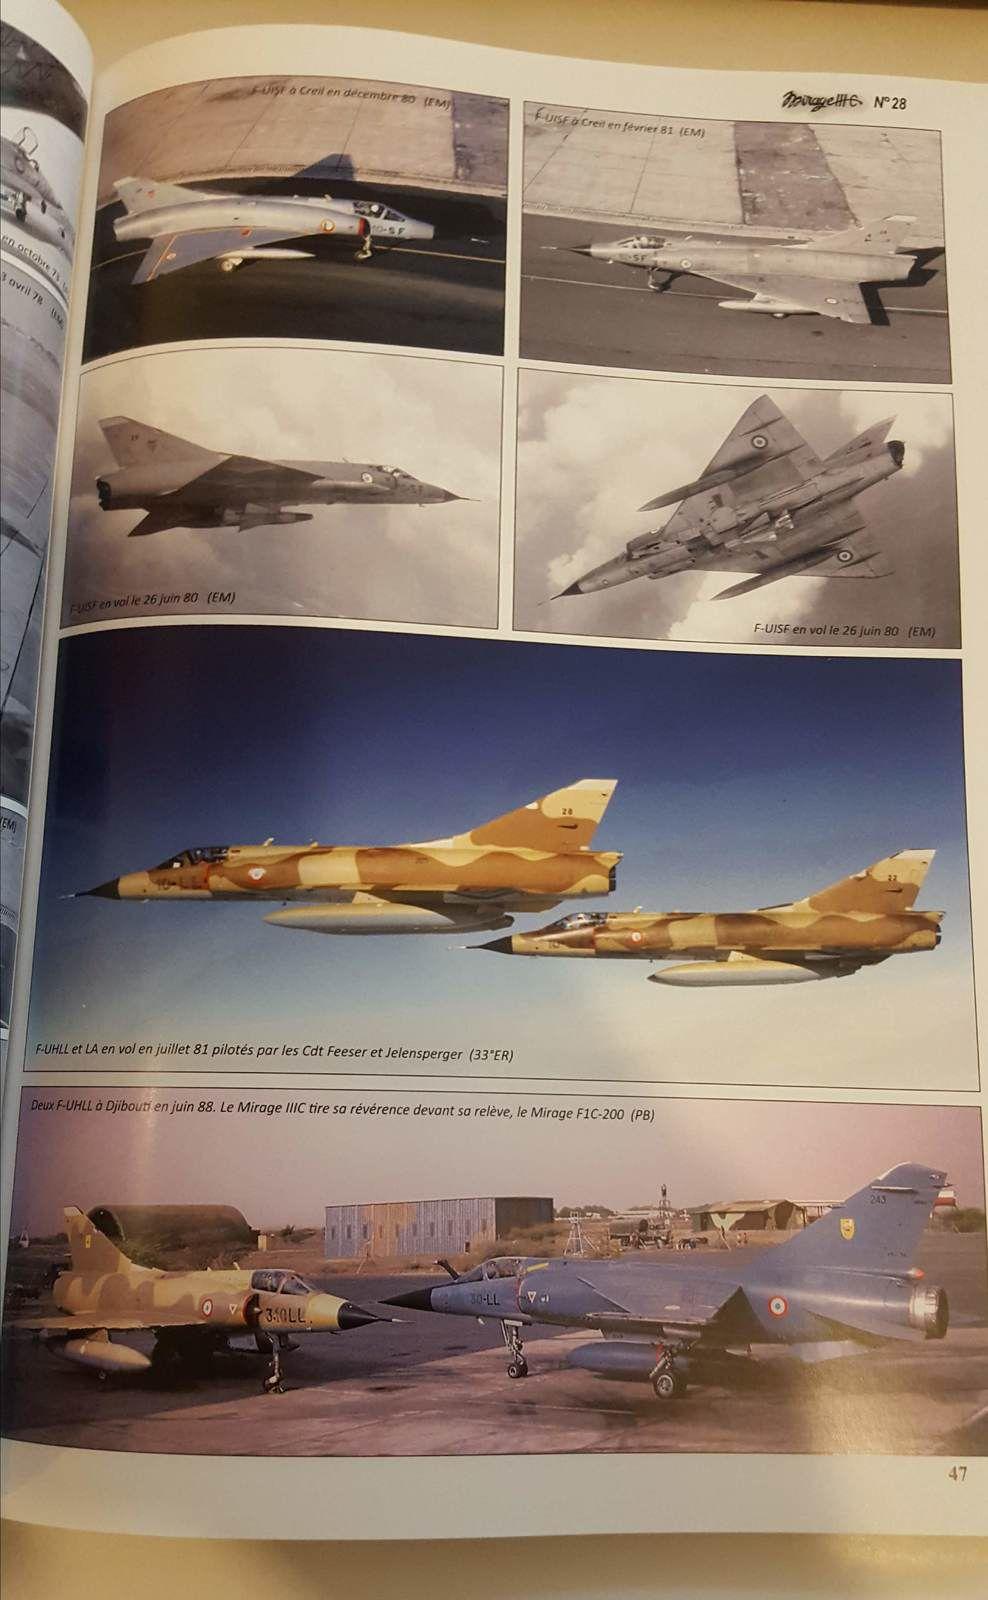 la saga du Mirage III C